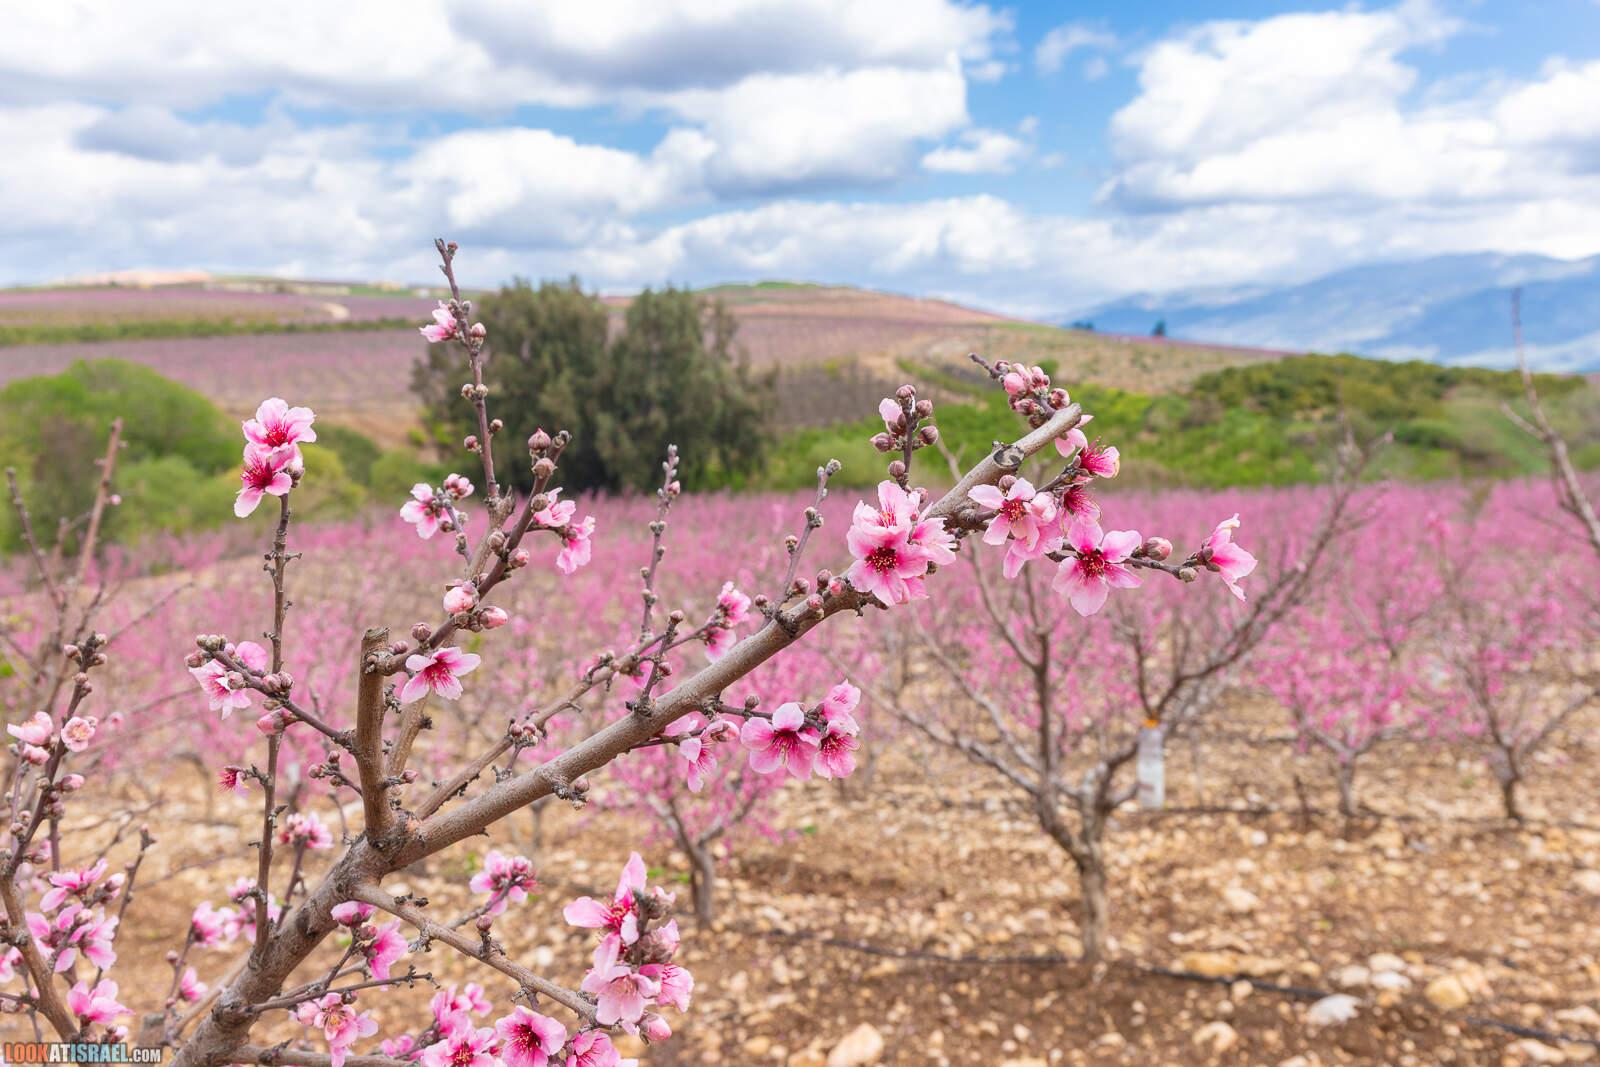 Цветение персиков в Галилее | LookAtIsrael.com - Фото путешествия по Израилю